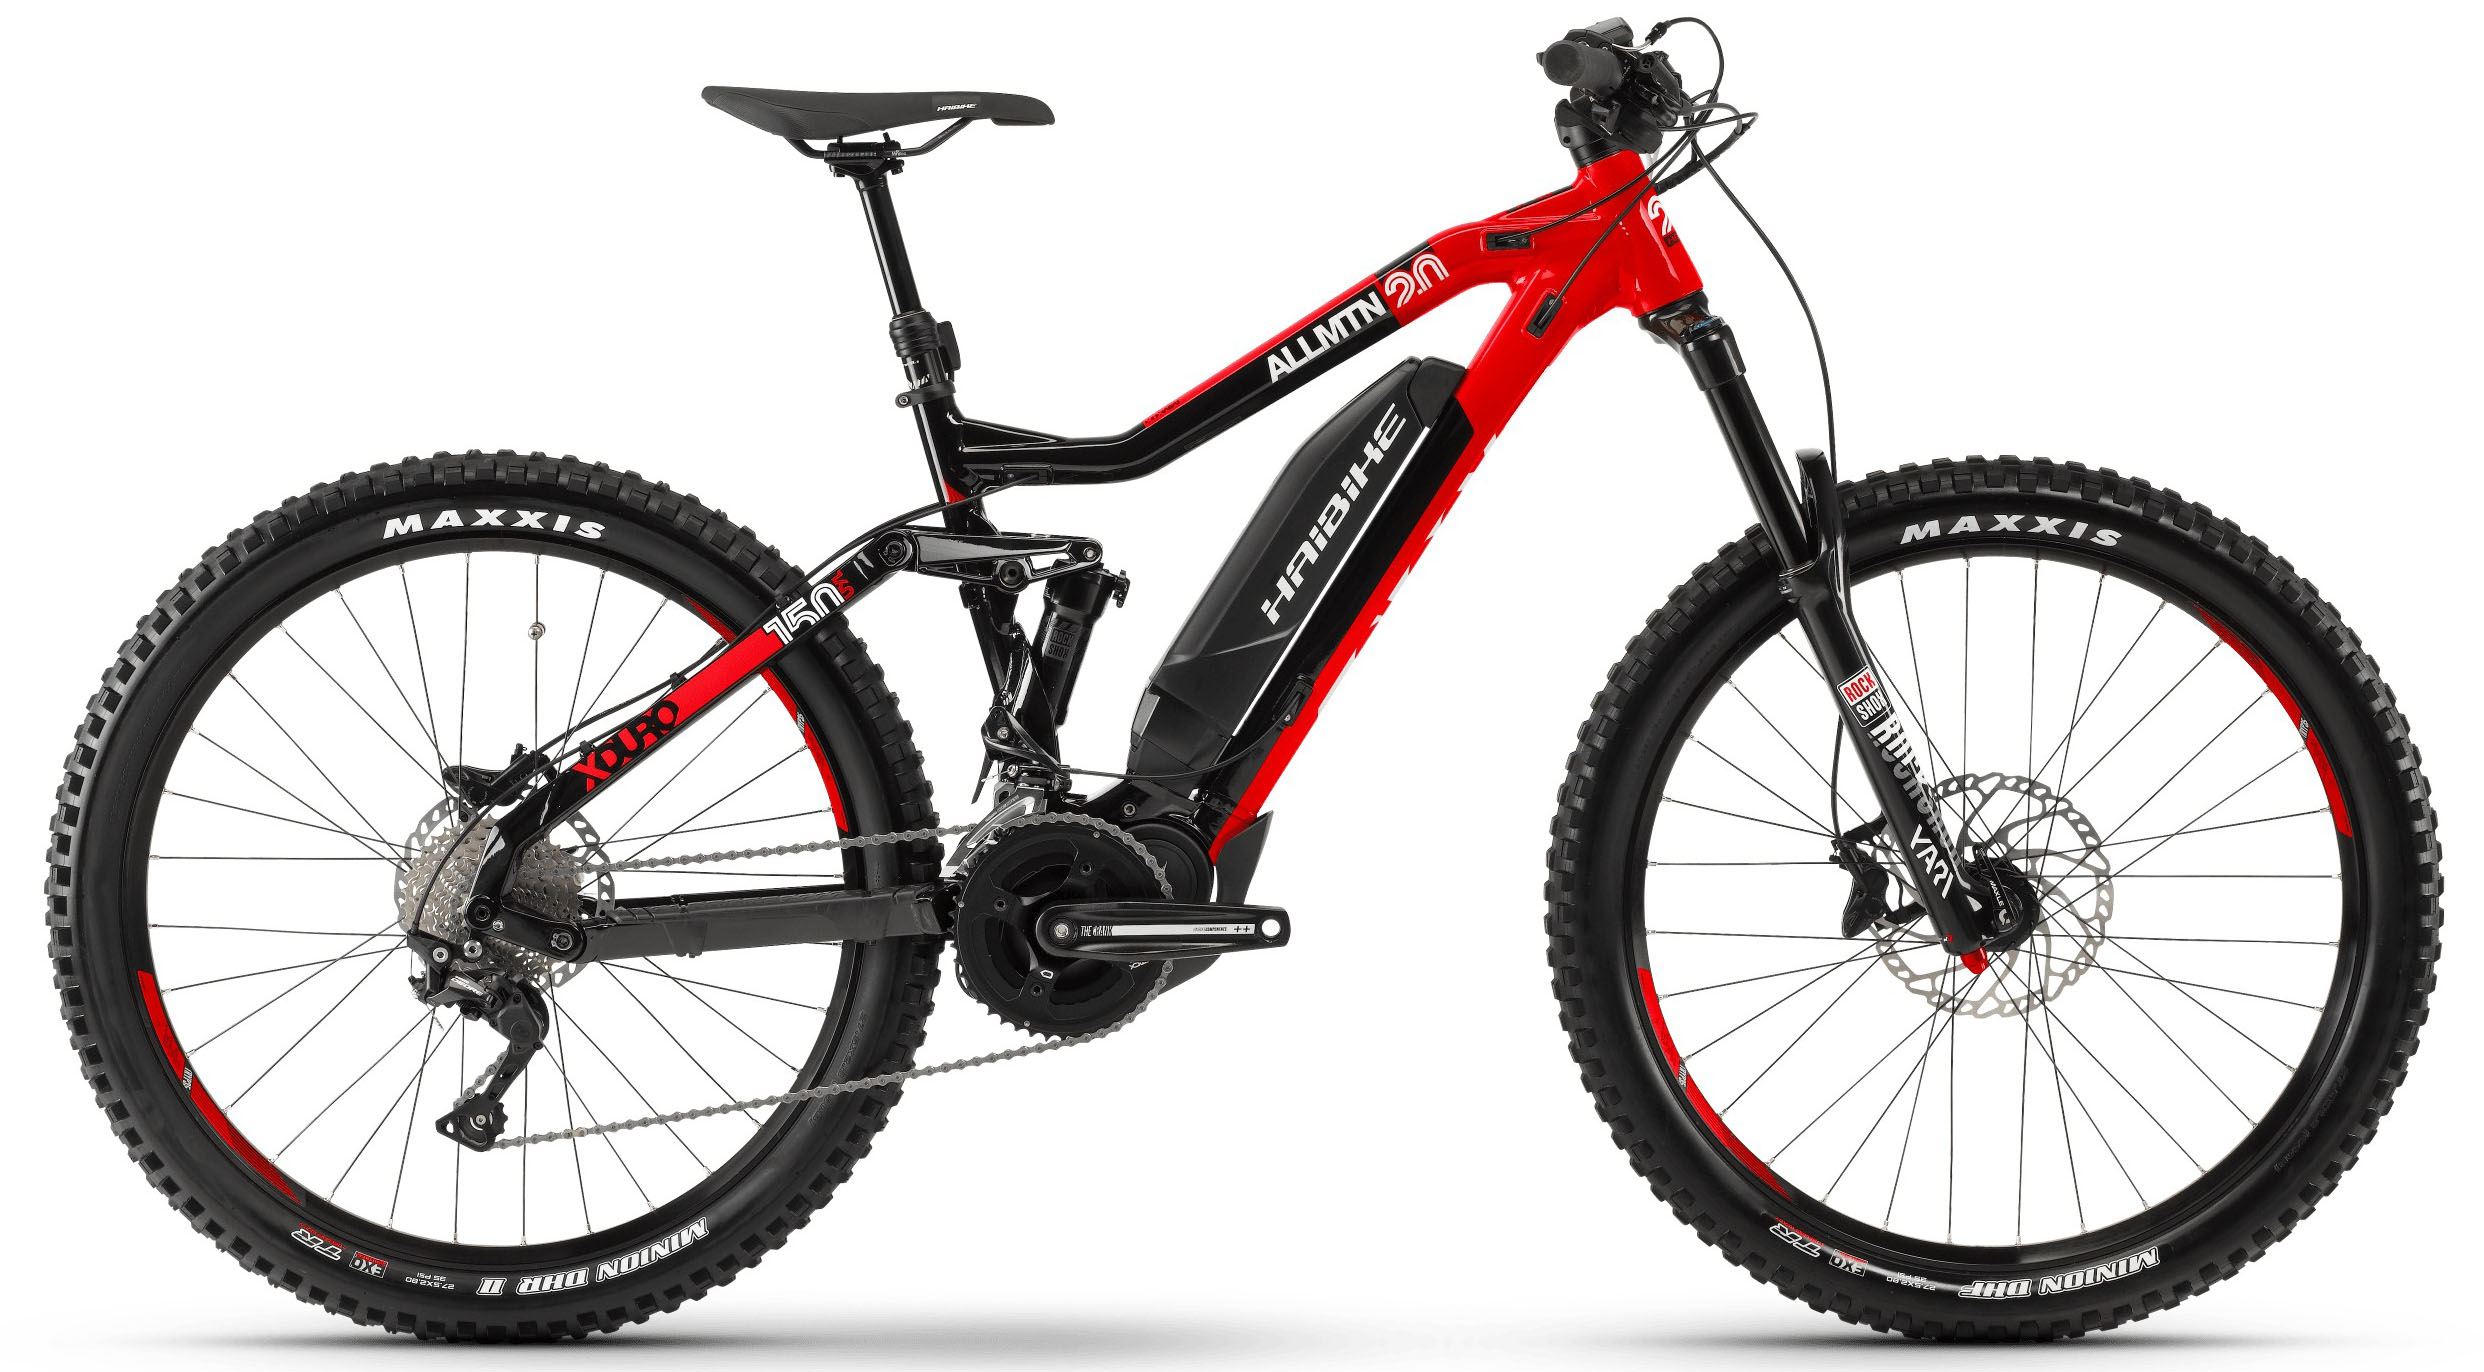 Велосипед Haibike XDURO AllMtn 2.0 500Wh 20-G Deore 2019 велосипед haibike xduro race 2015